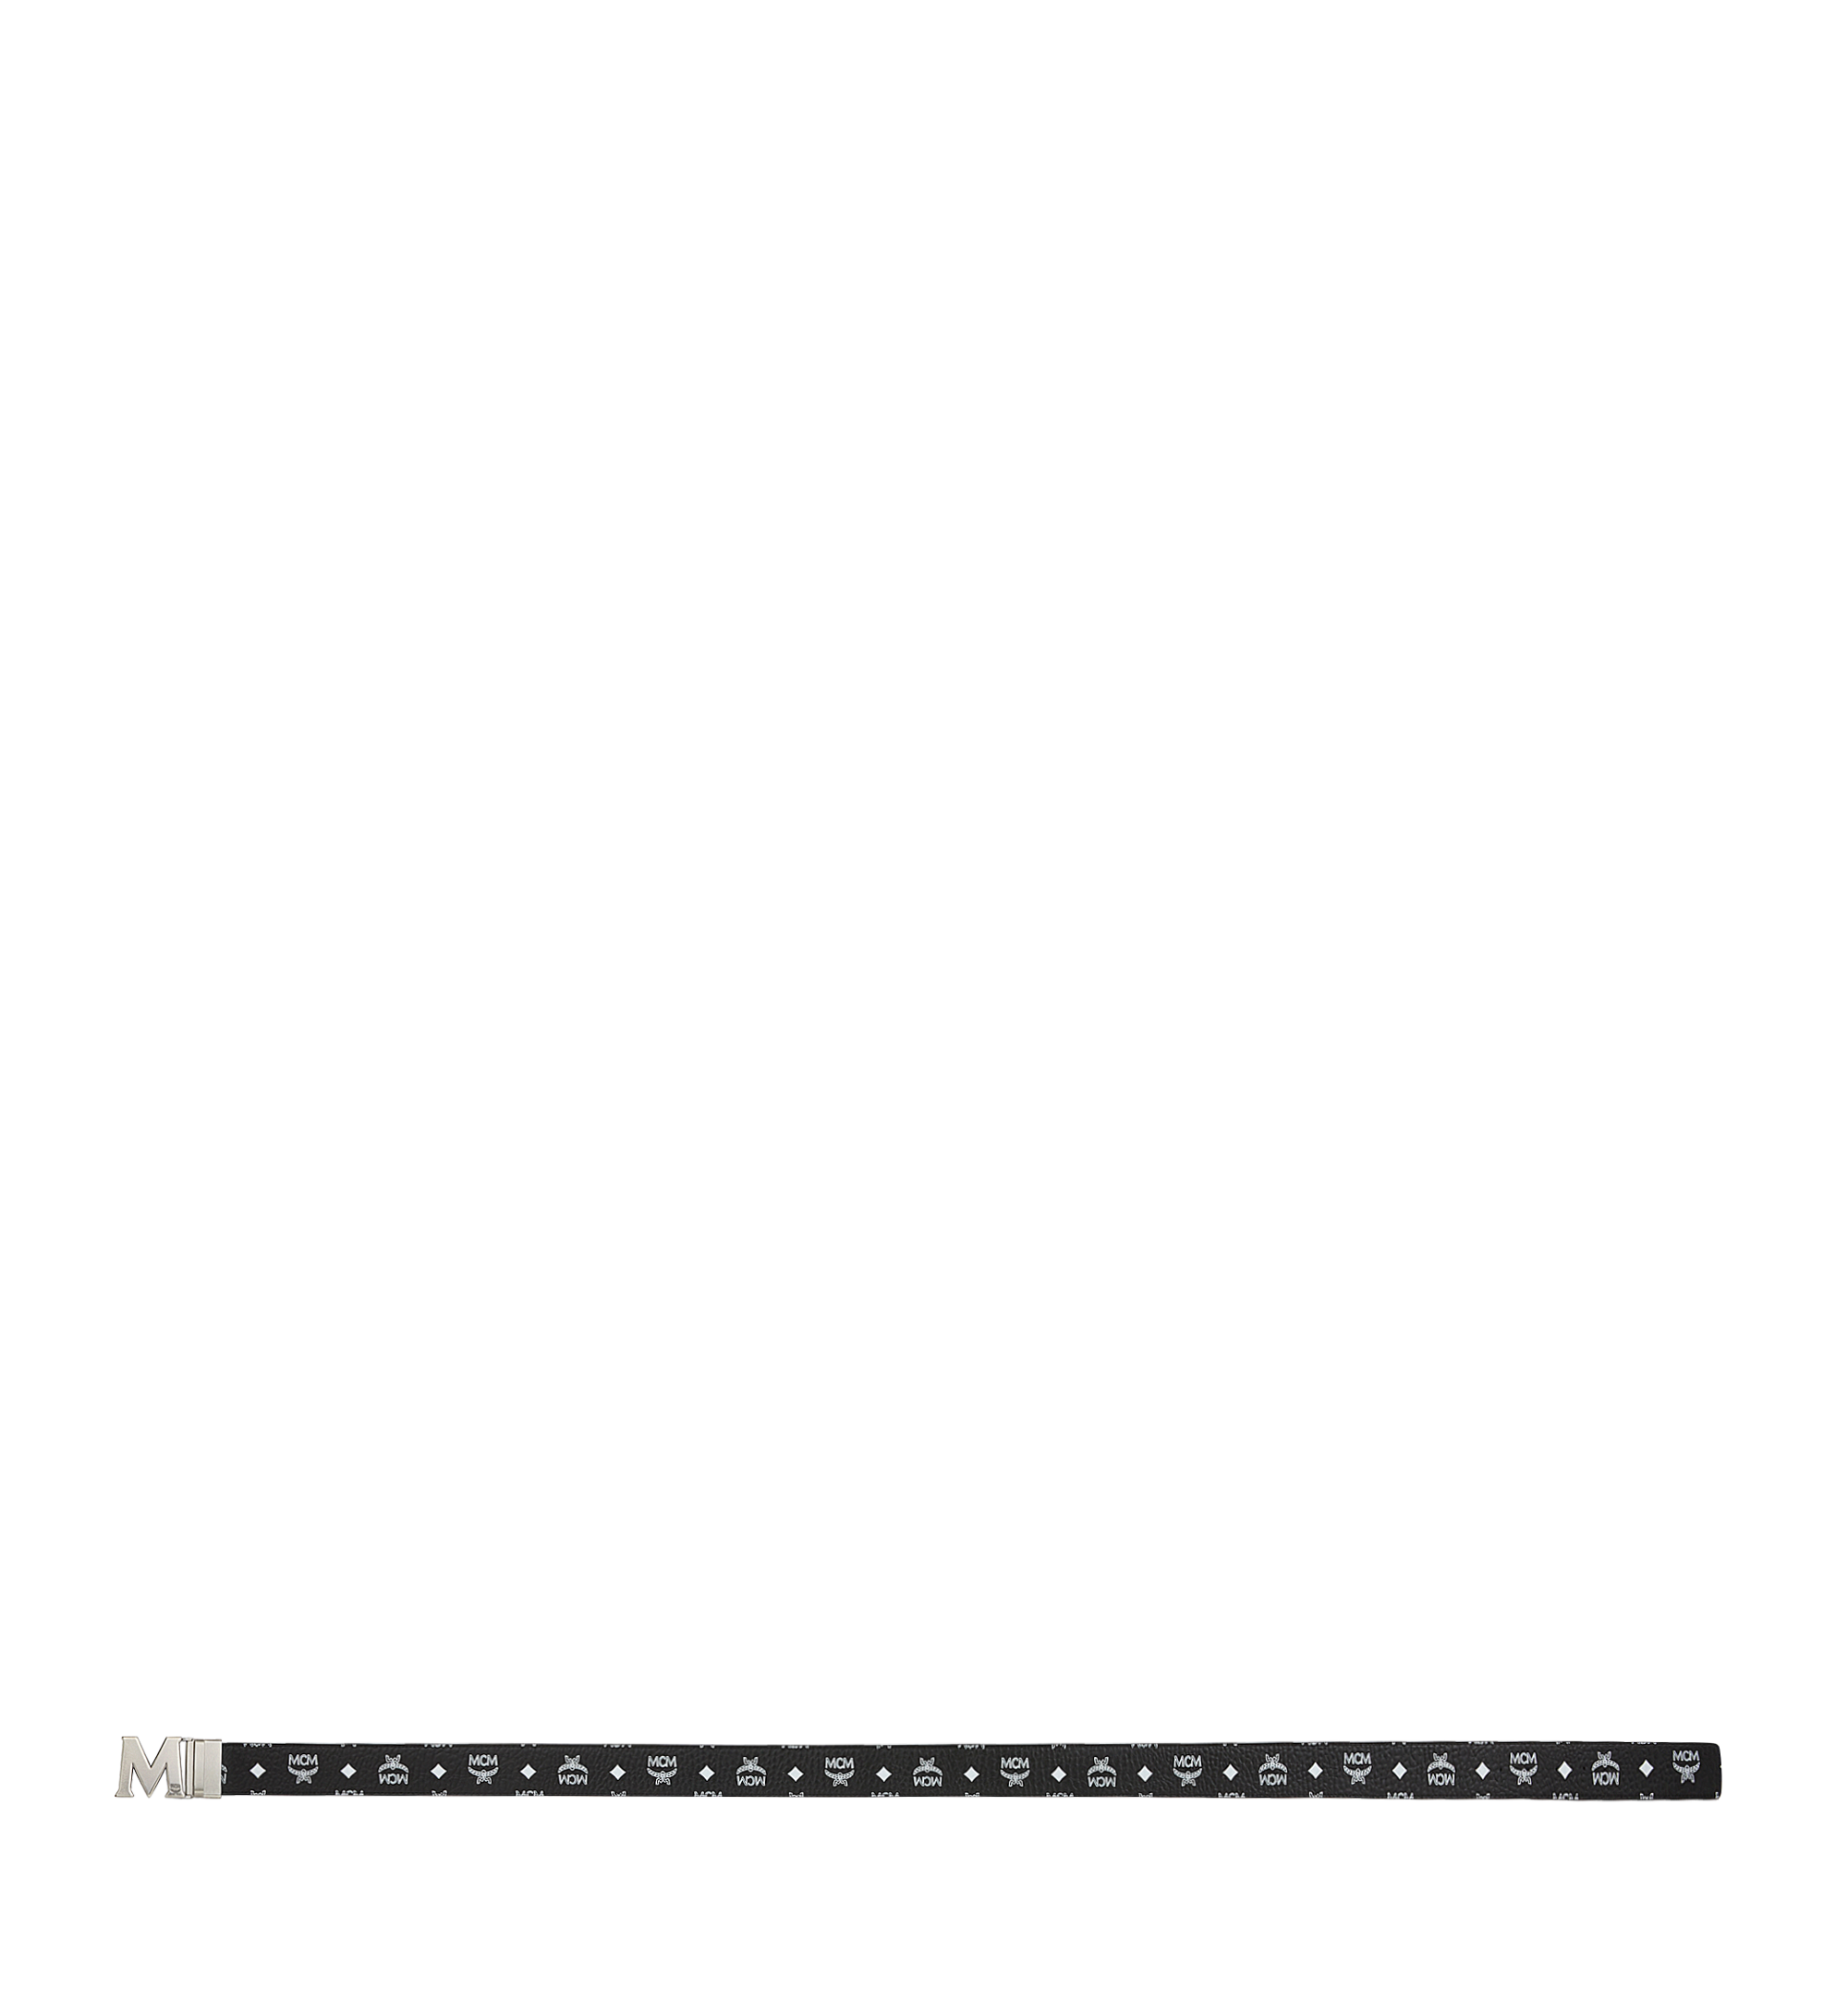 "MCM Antique M Reversible Belt 1.75"" in White Logo  Visetos Black MXB9SVI14BV001 Alternate View 3"